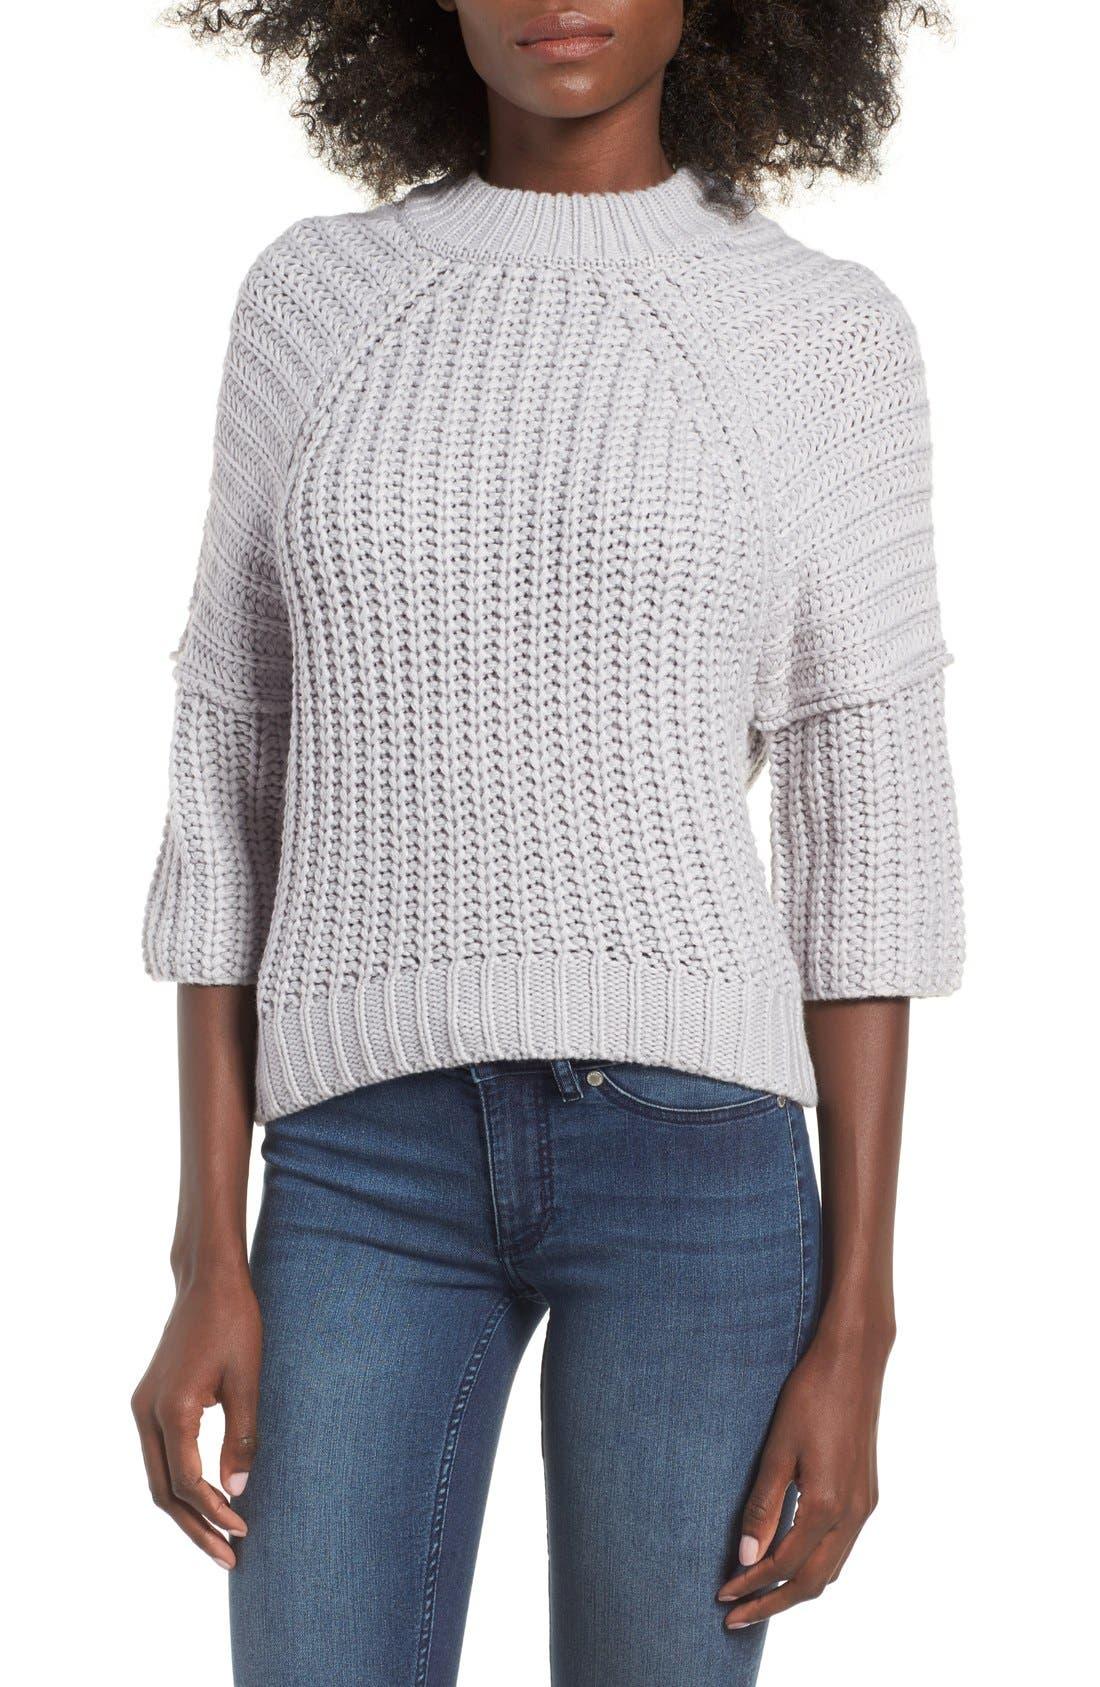 Alternate Image 1 Selected - J.O.A. Rib Knit Sweater